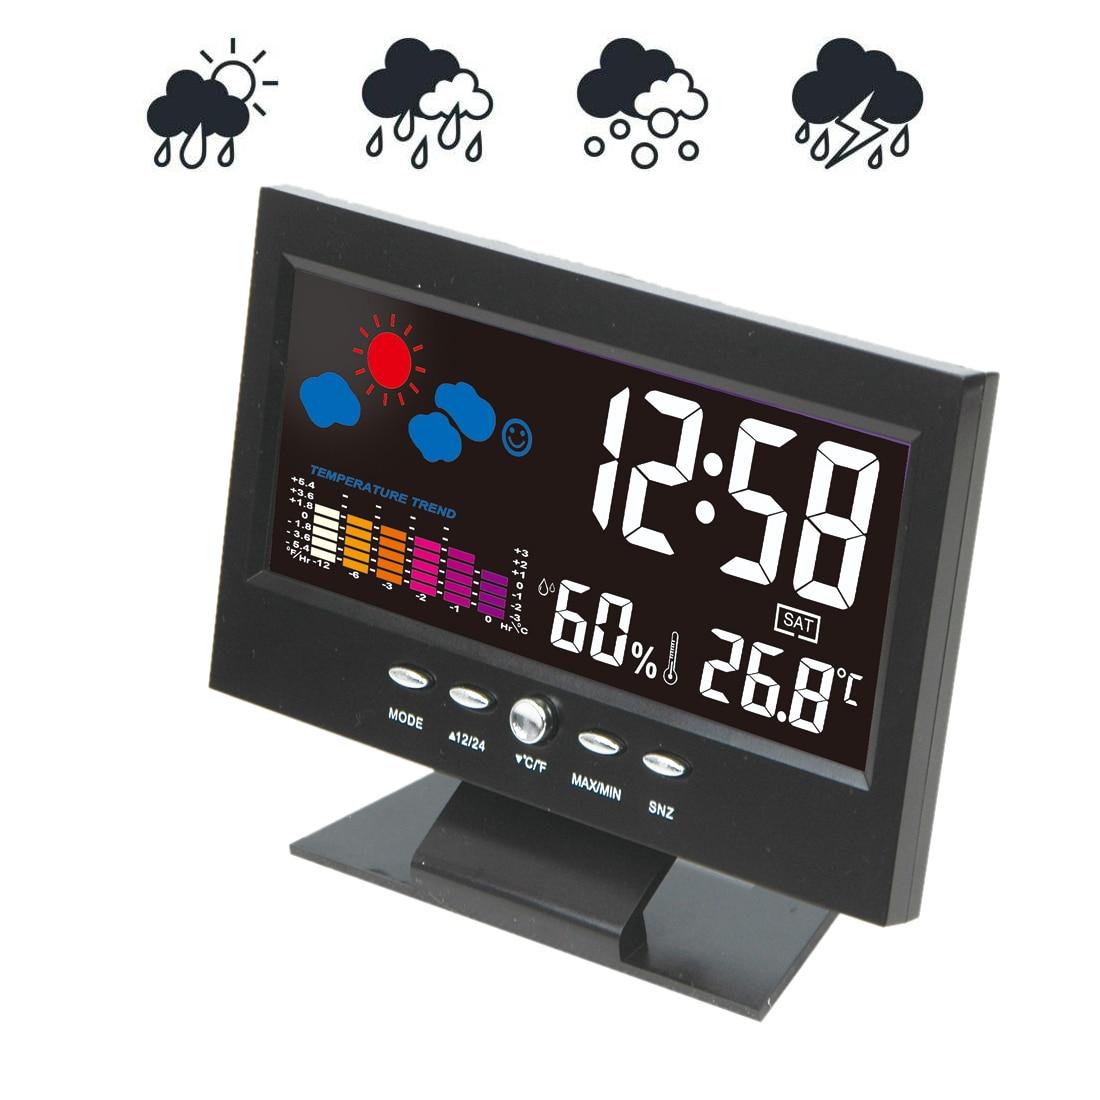 Weather Station Alarm Clock Hygrometer Digital Barometer Colorful Thermometer Calendar Clock Desk LCD Display